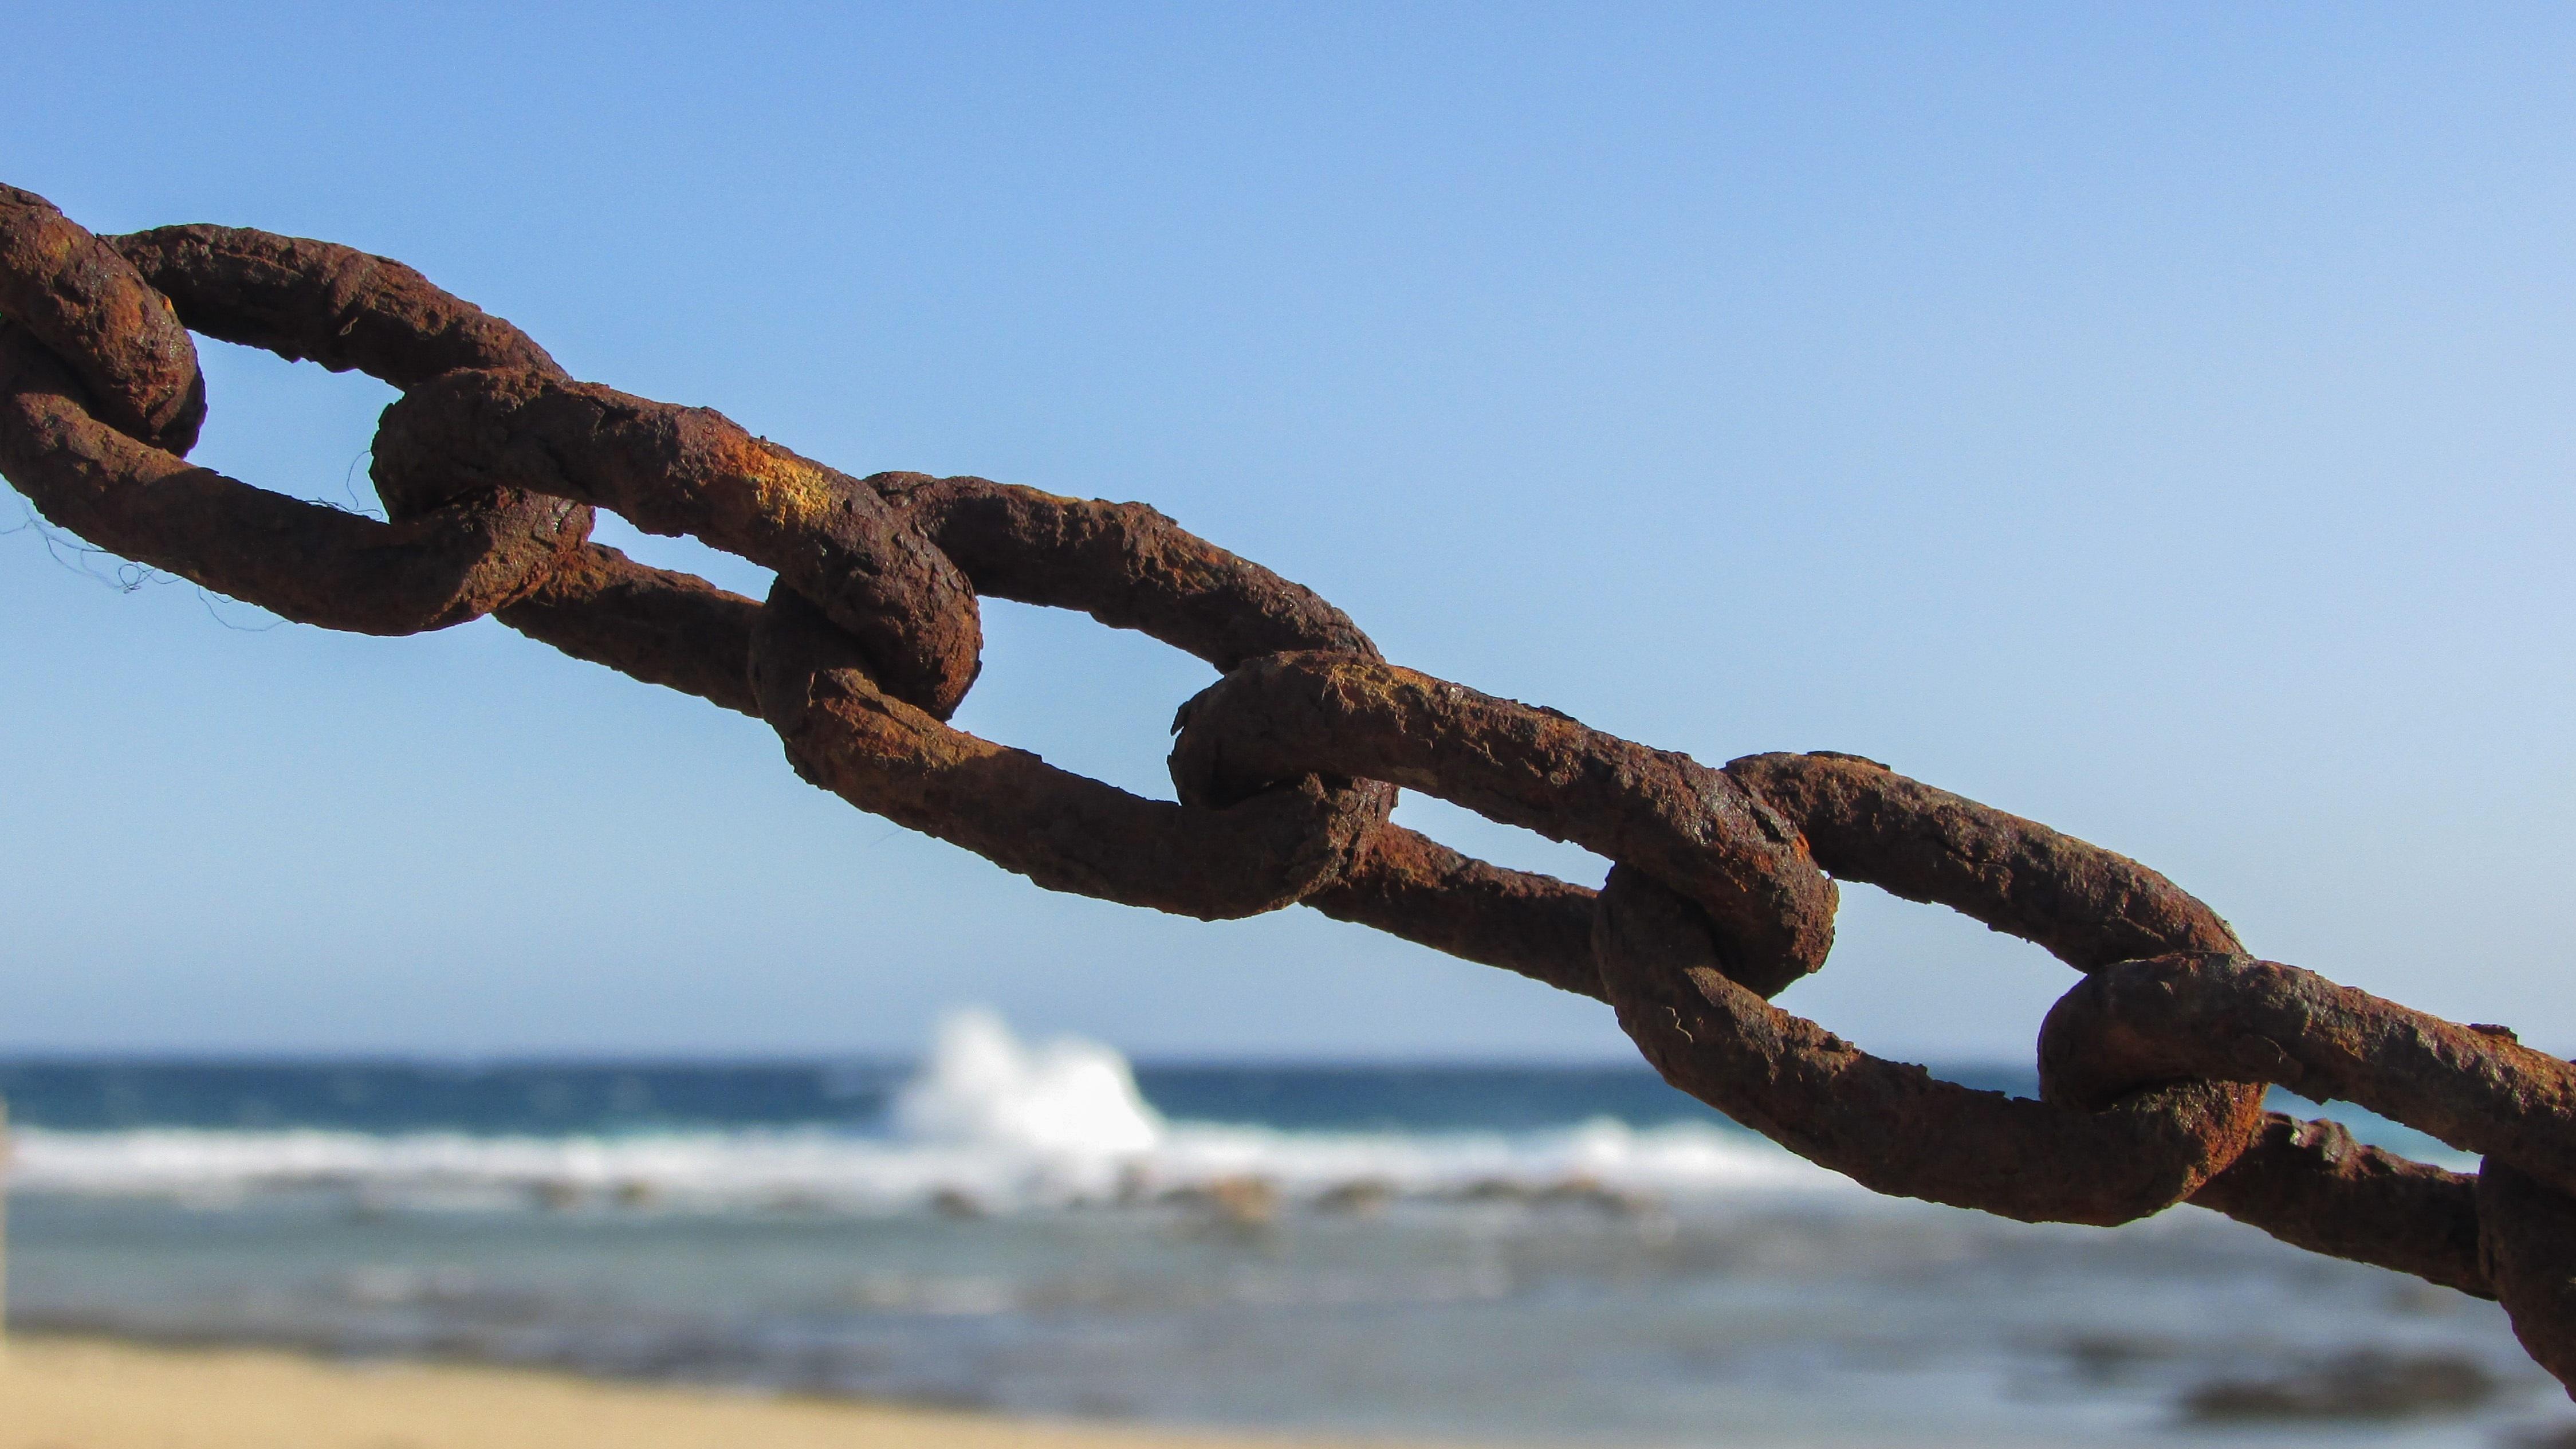 Kostenlose foto : Strand, Meer, Ast, Zaun, Holz, Kette, Wind, alt ...